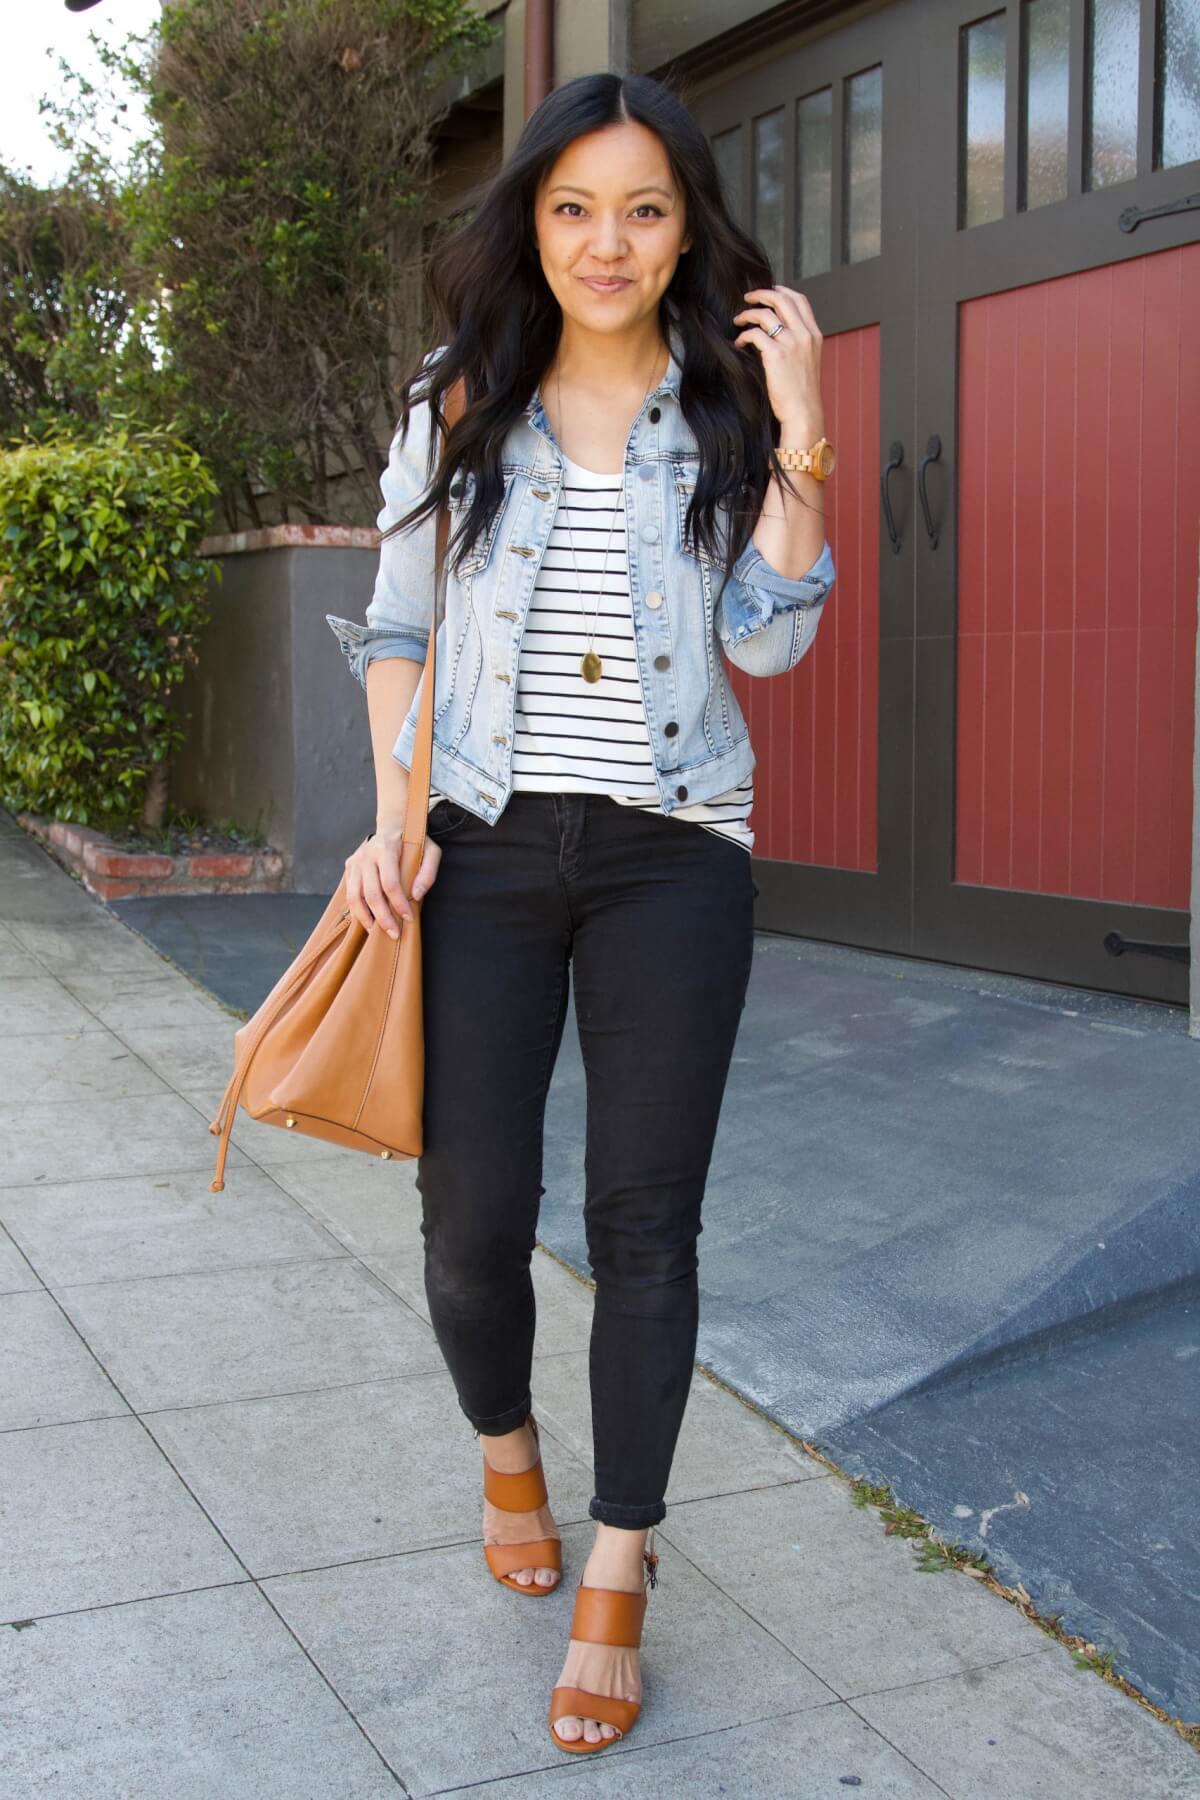 Classic Outfit: striped tee + black jeans + denim jacket + nude sandals + pendant necklace + tan bag